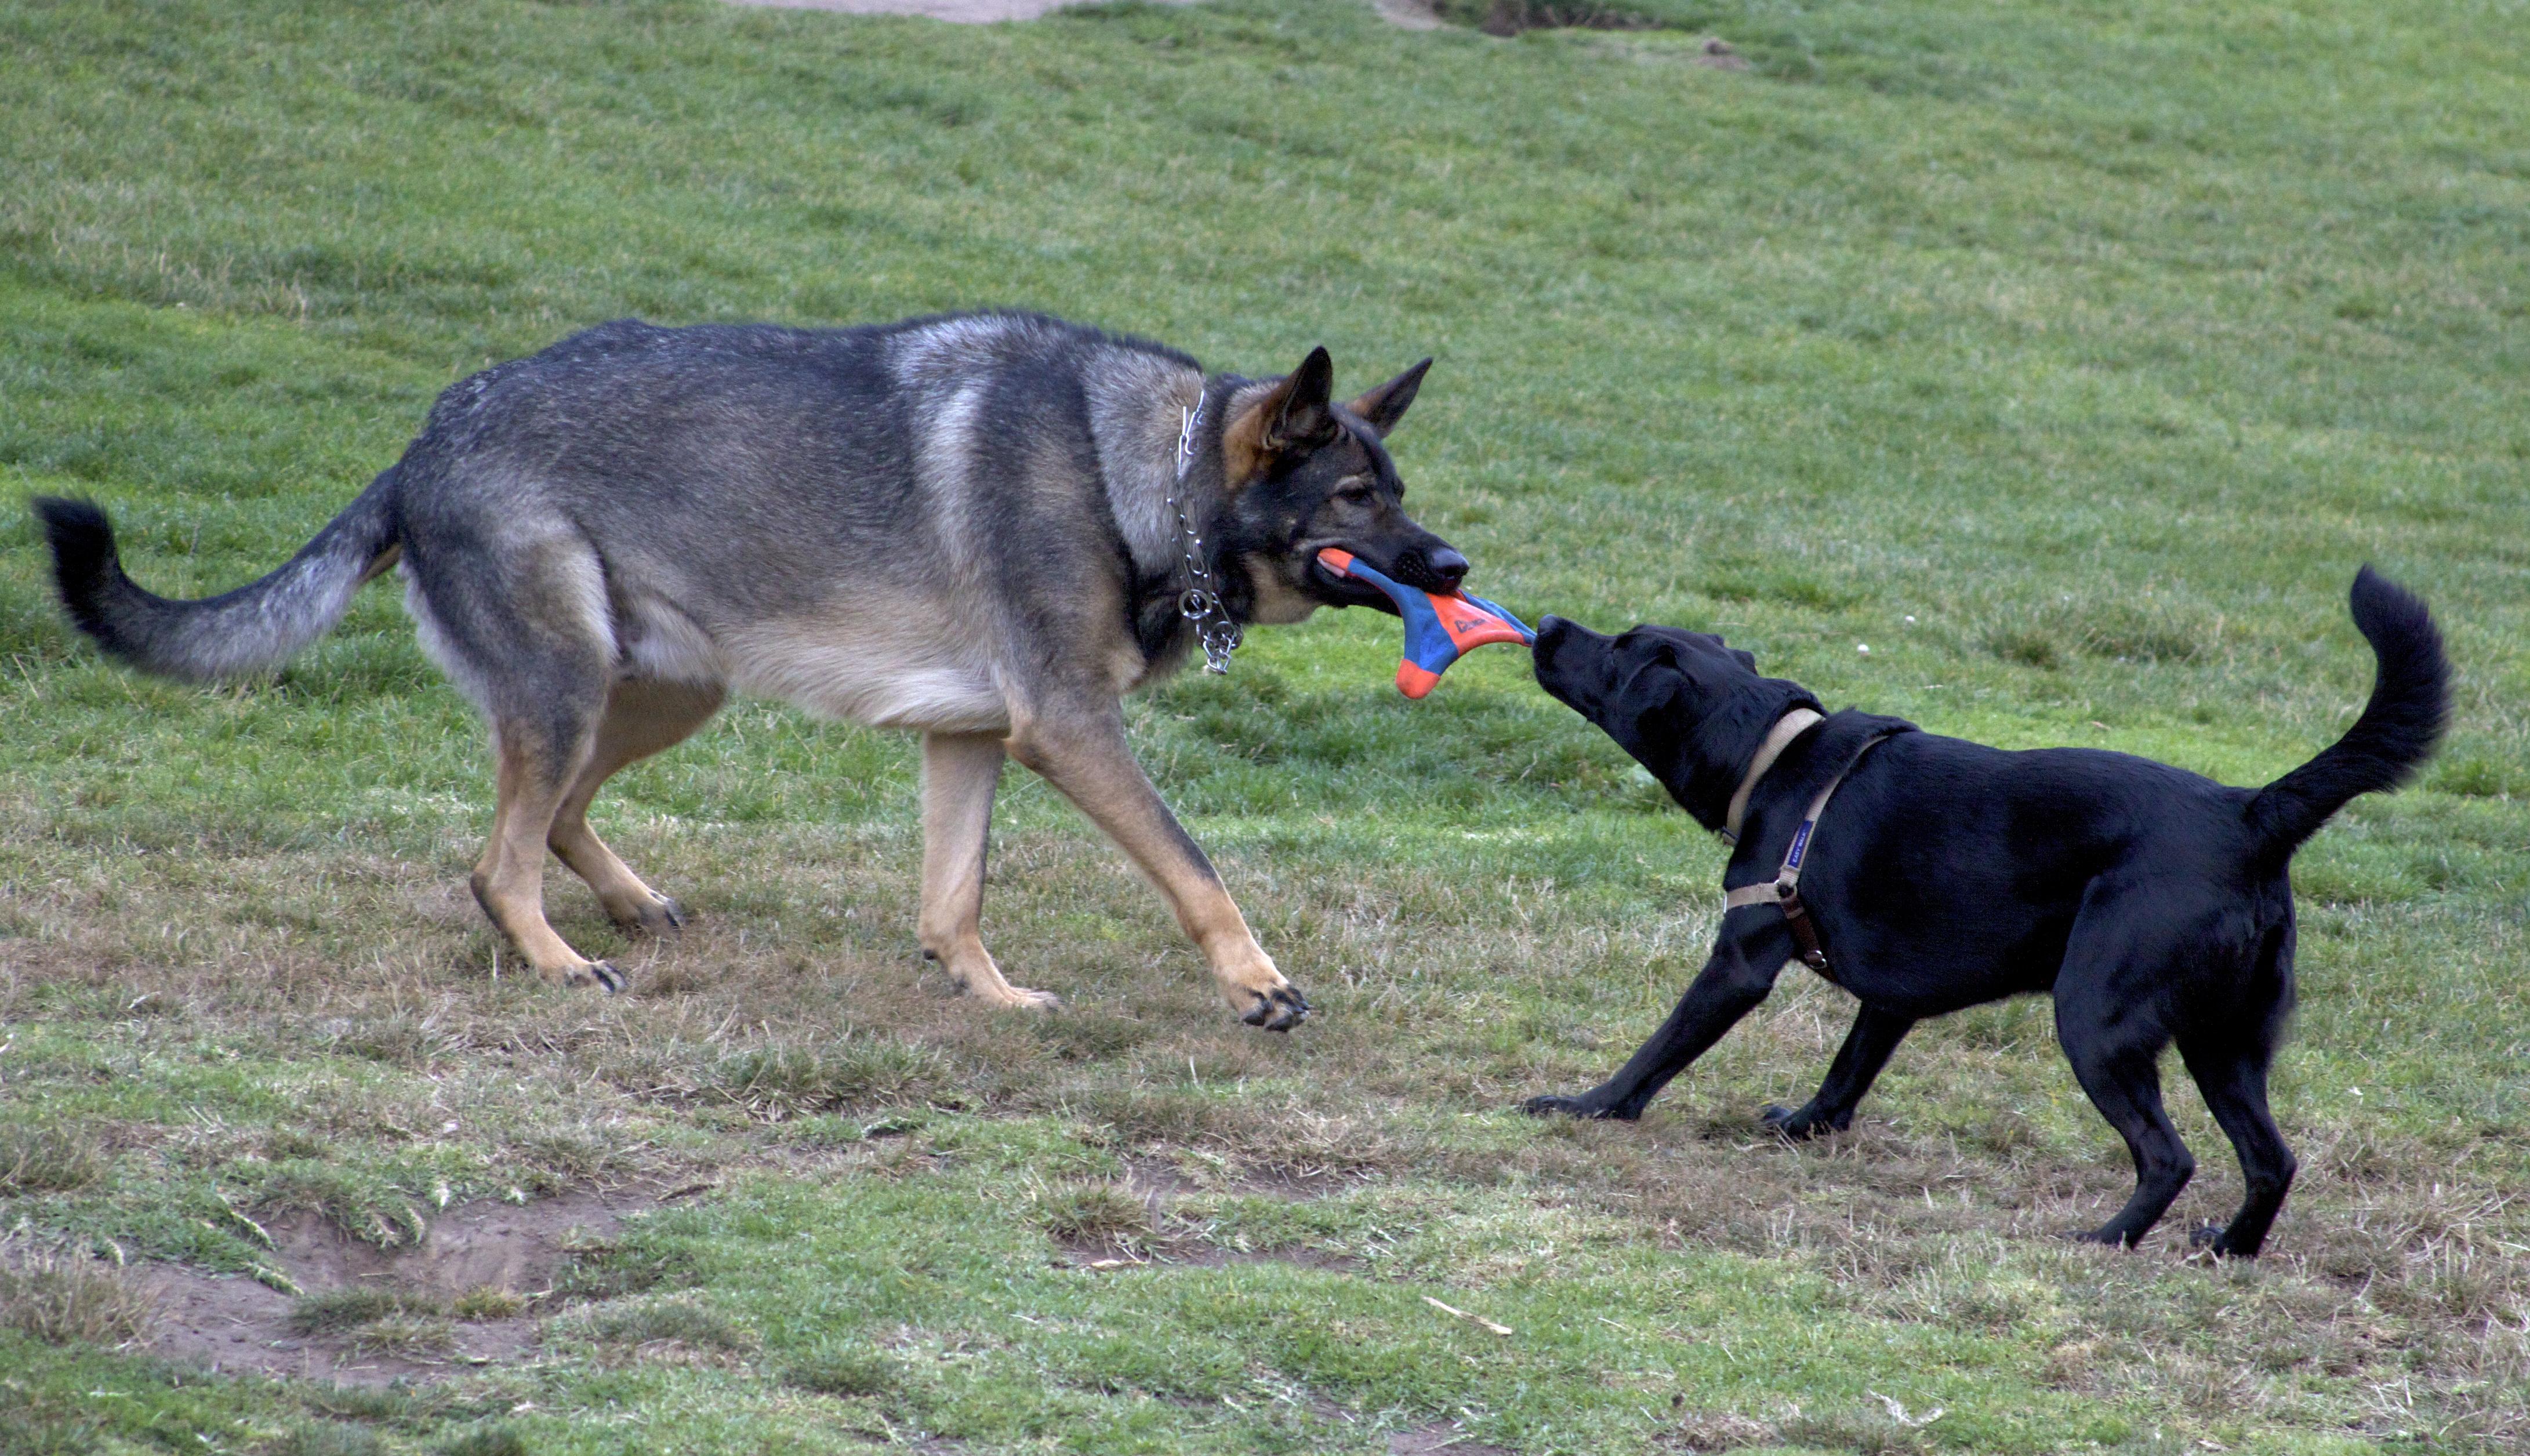 German Shepherd and Lab Puppy